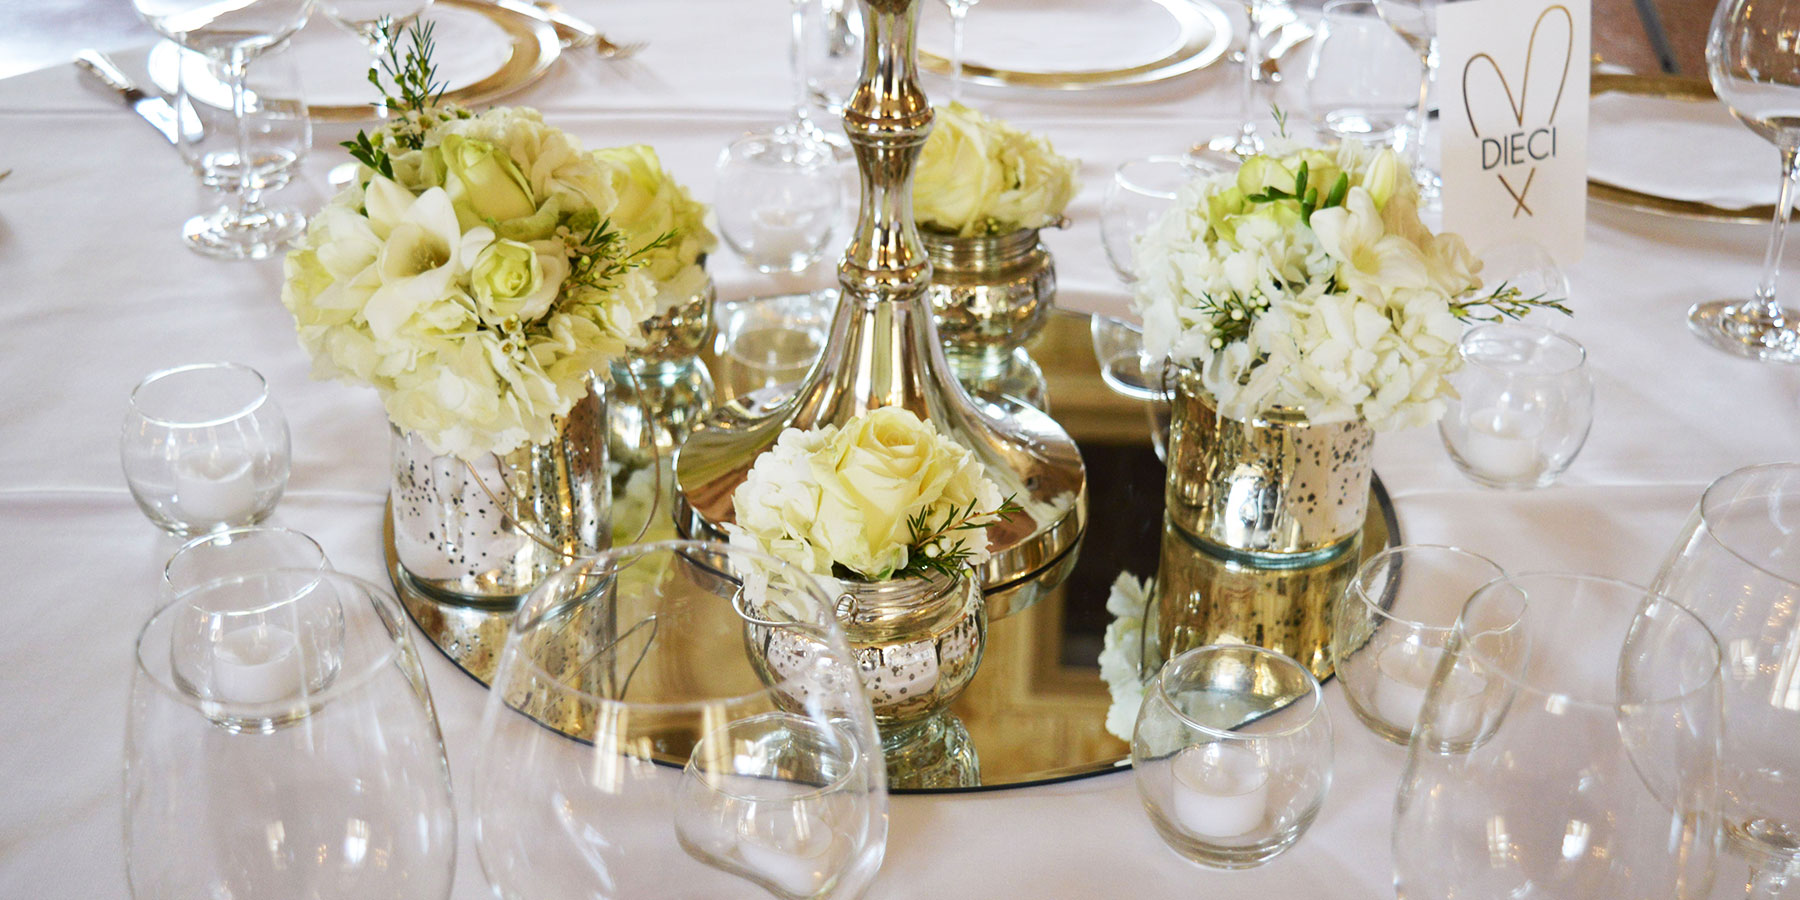 Flower Design, Events & Decor